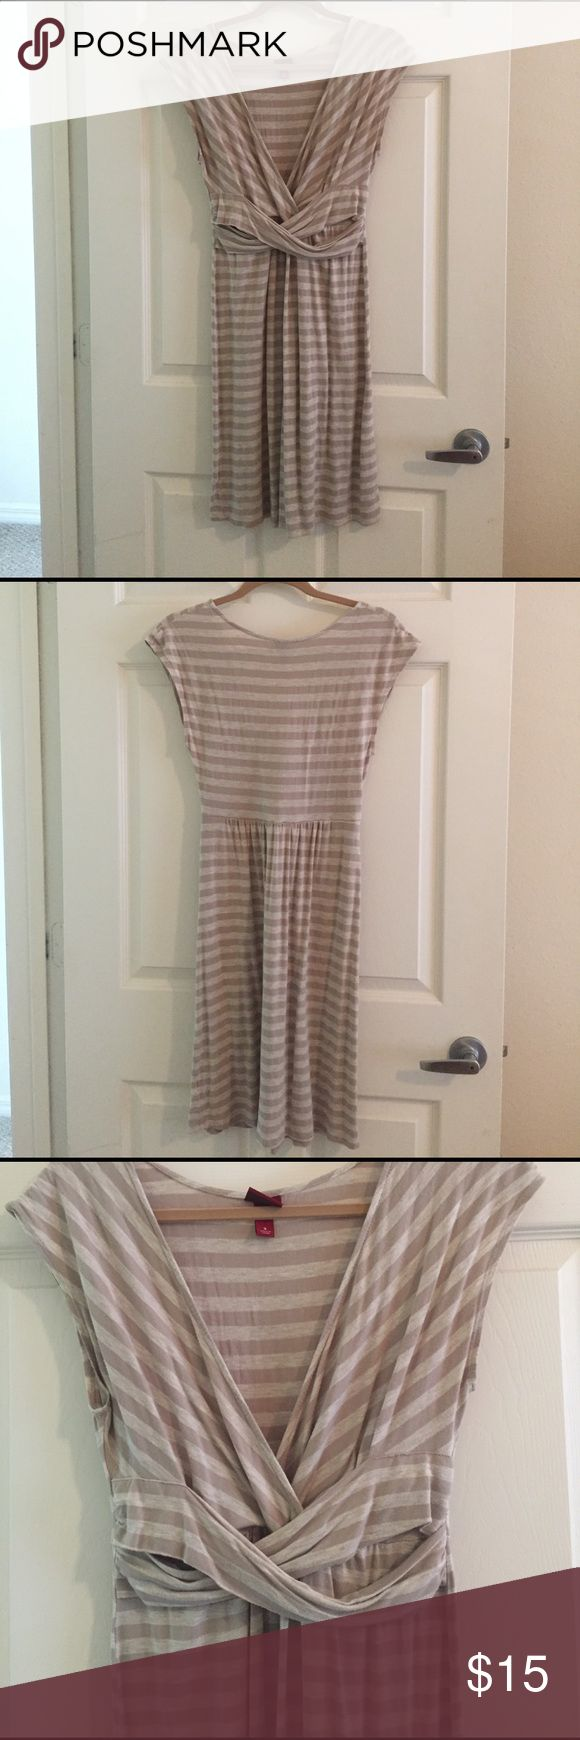 Merona casual dress Neutral striped sun dress, low v-neck, cap sleeve Merona Dresses Midi